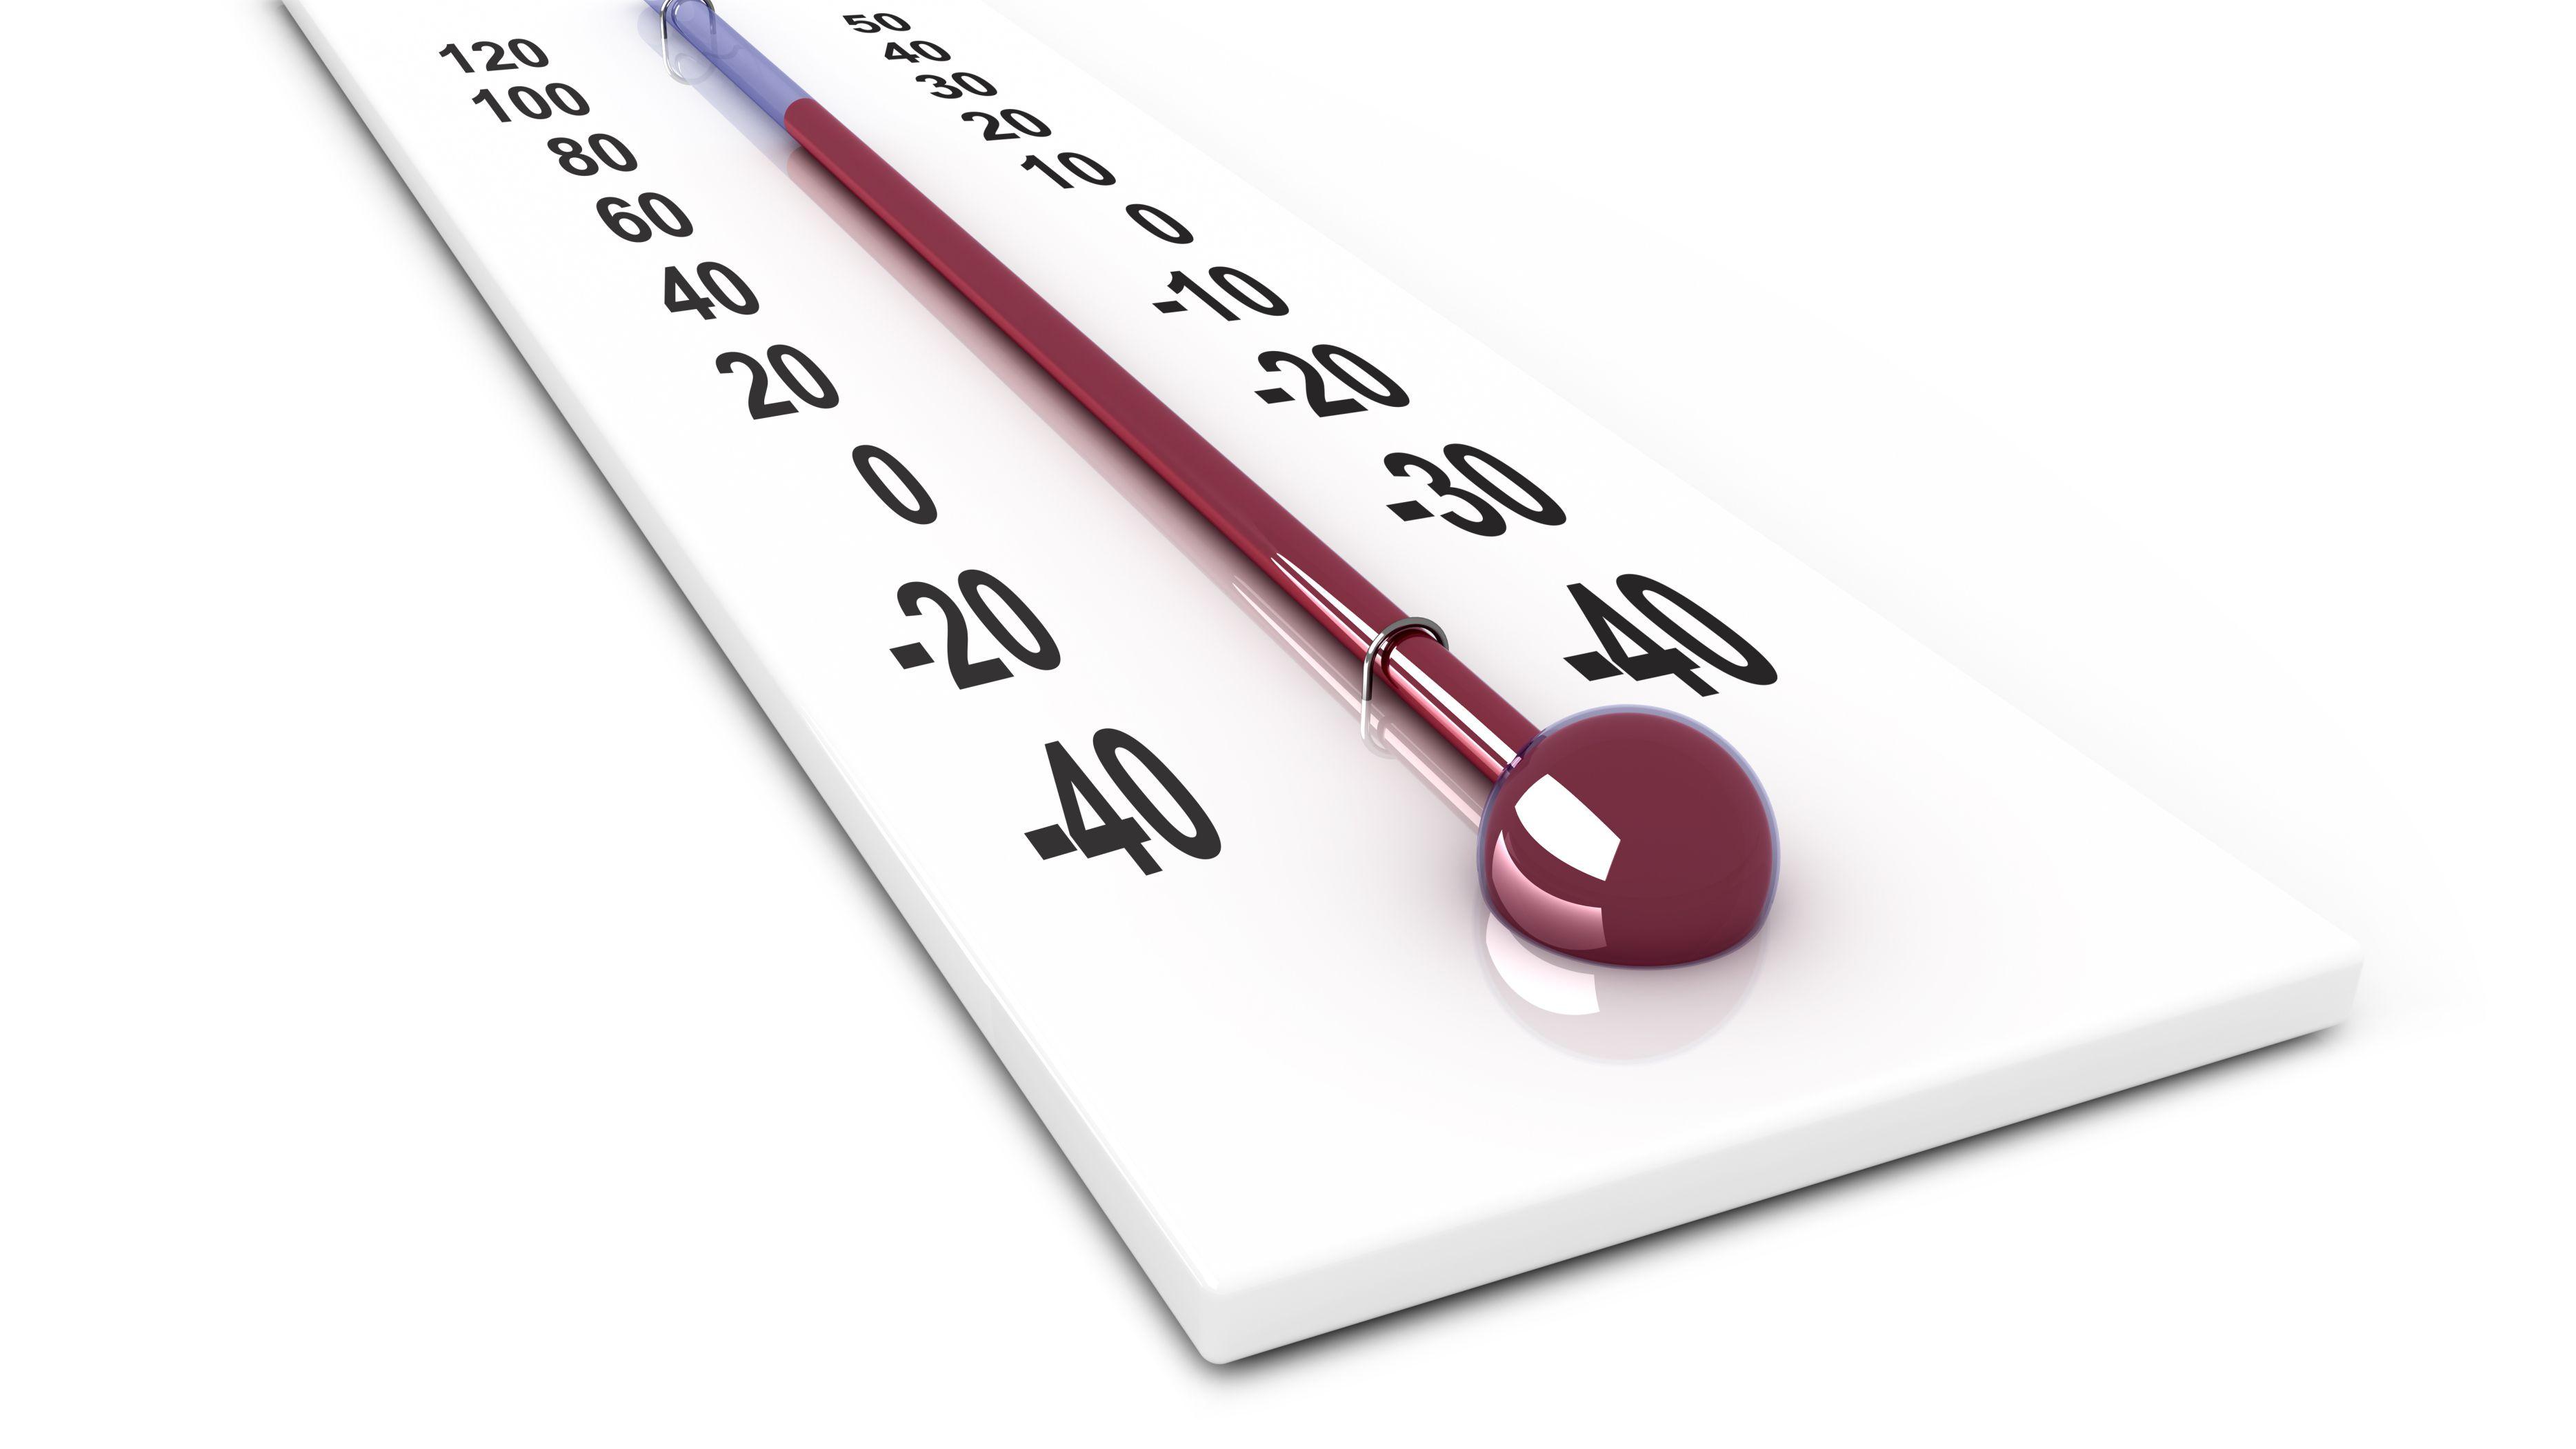 Temperature Conversion Table Worksheet